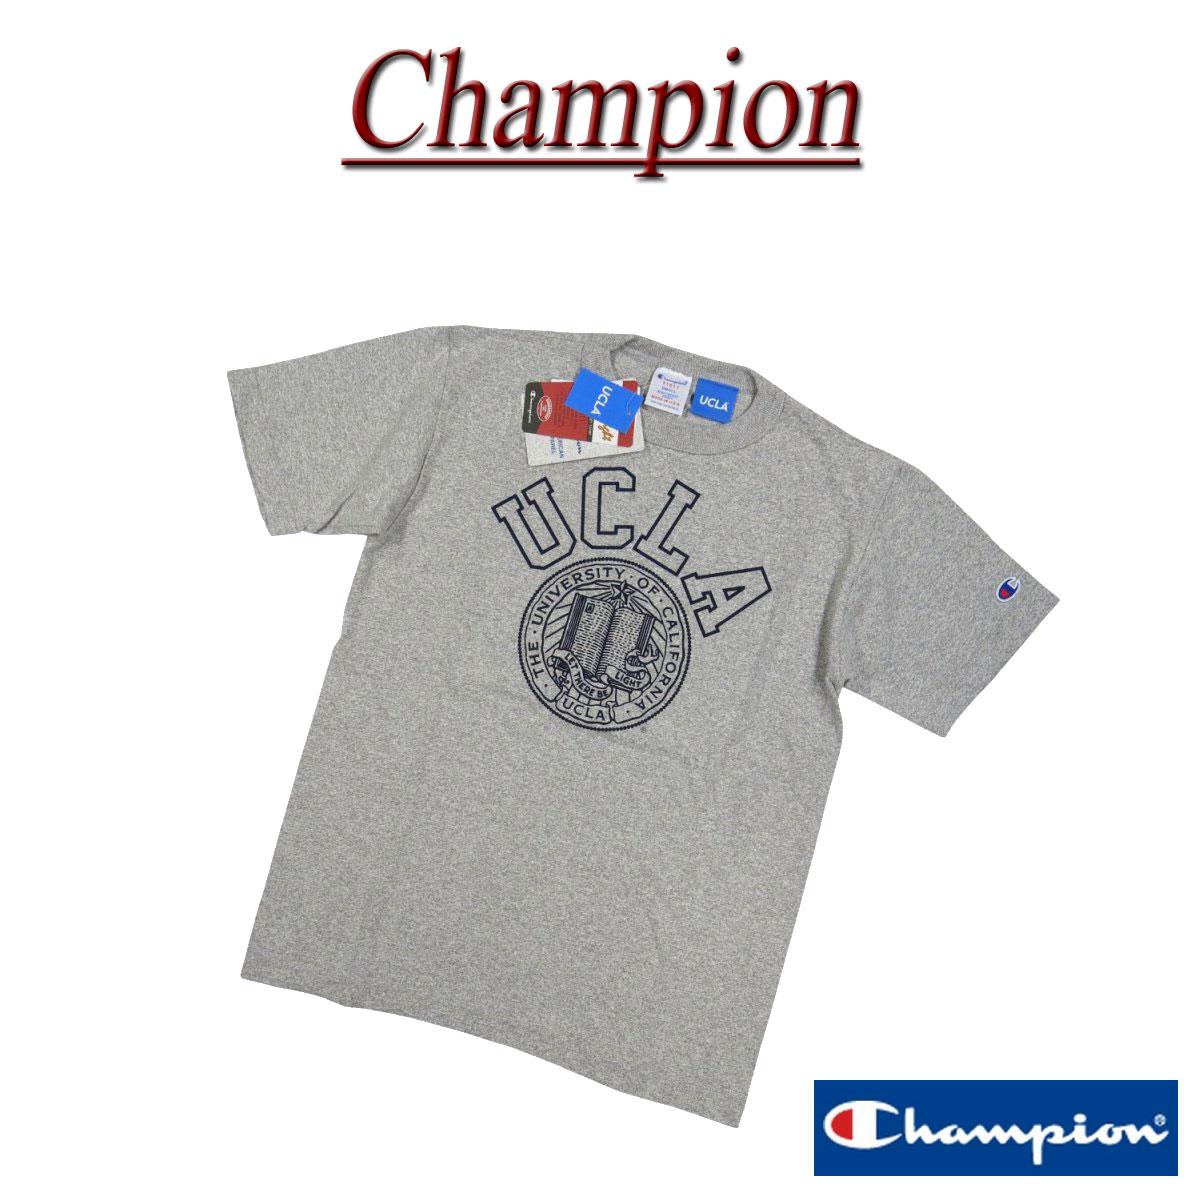 champion dri fit shirts